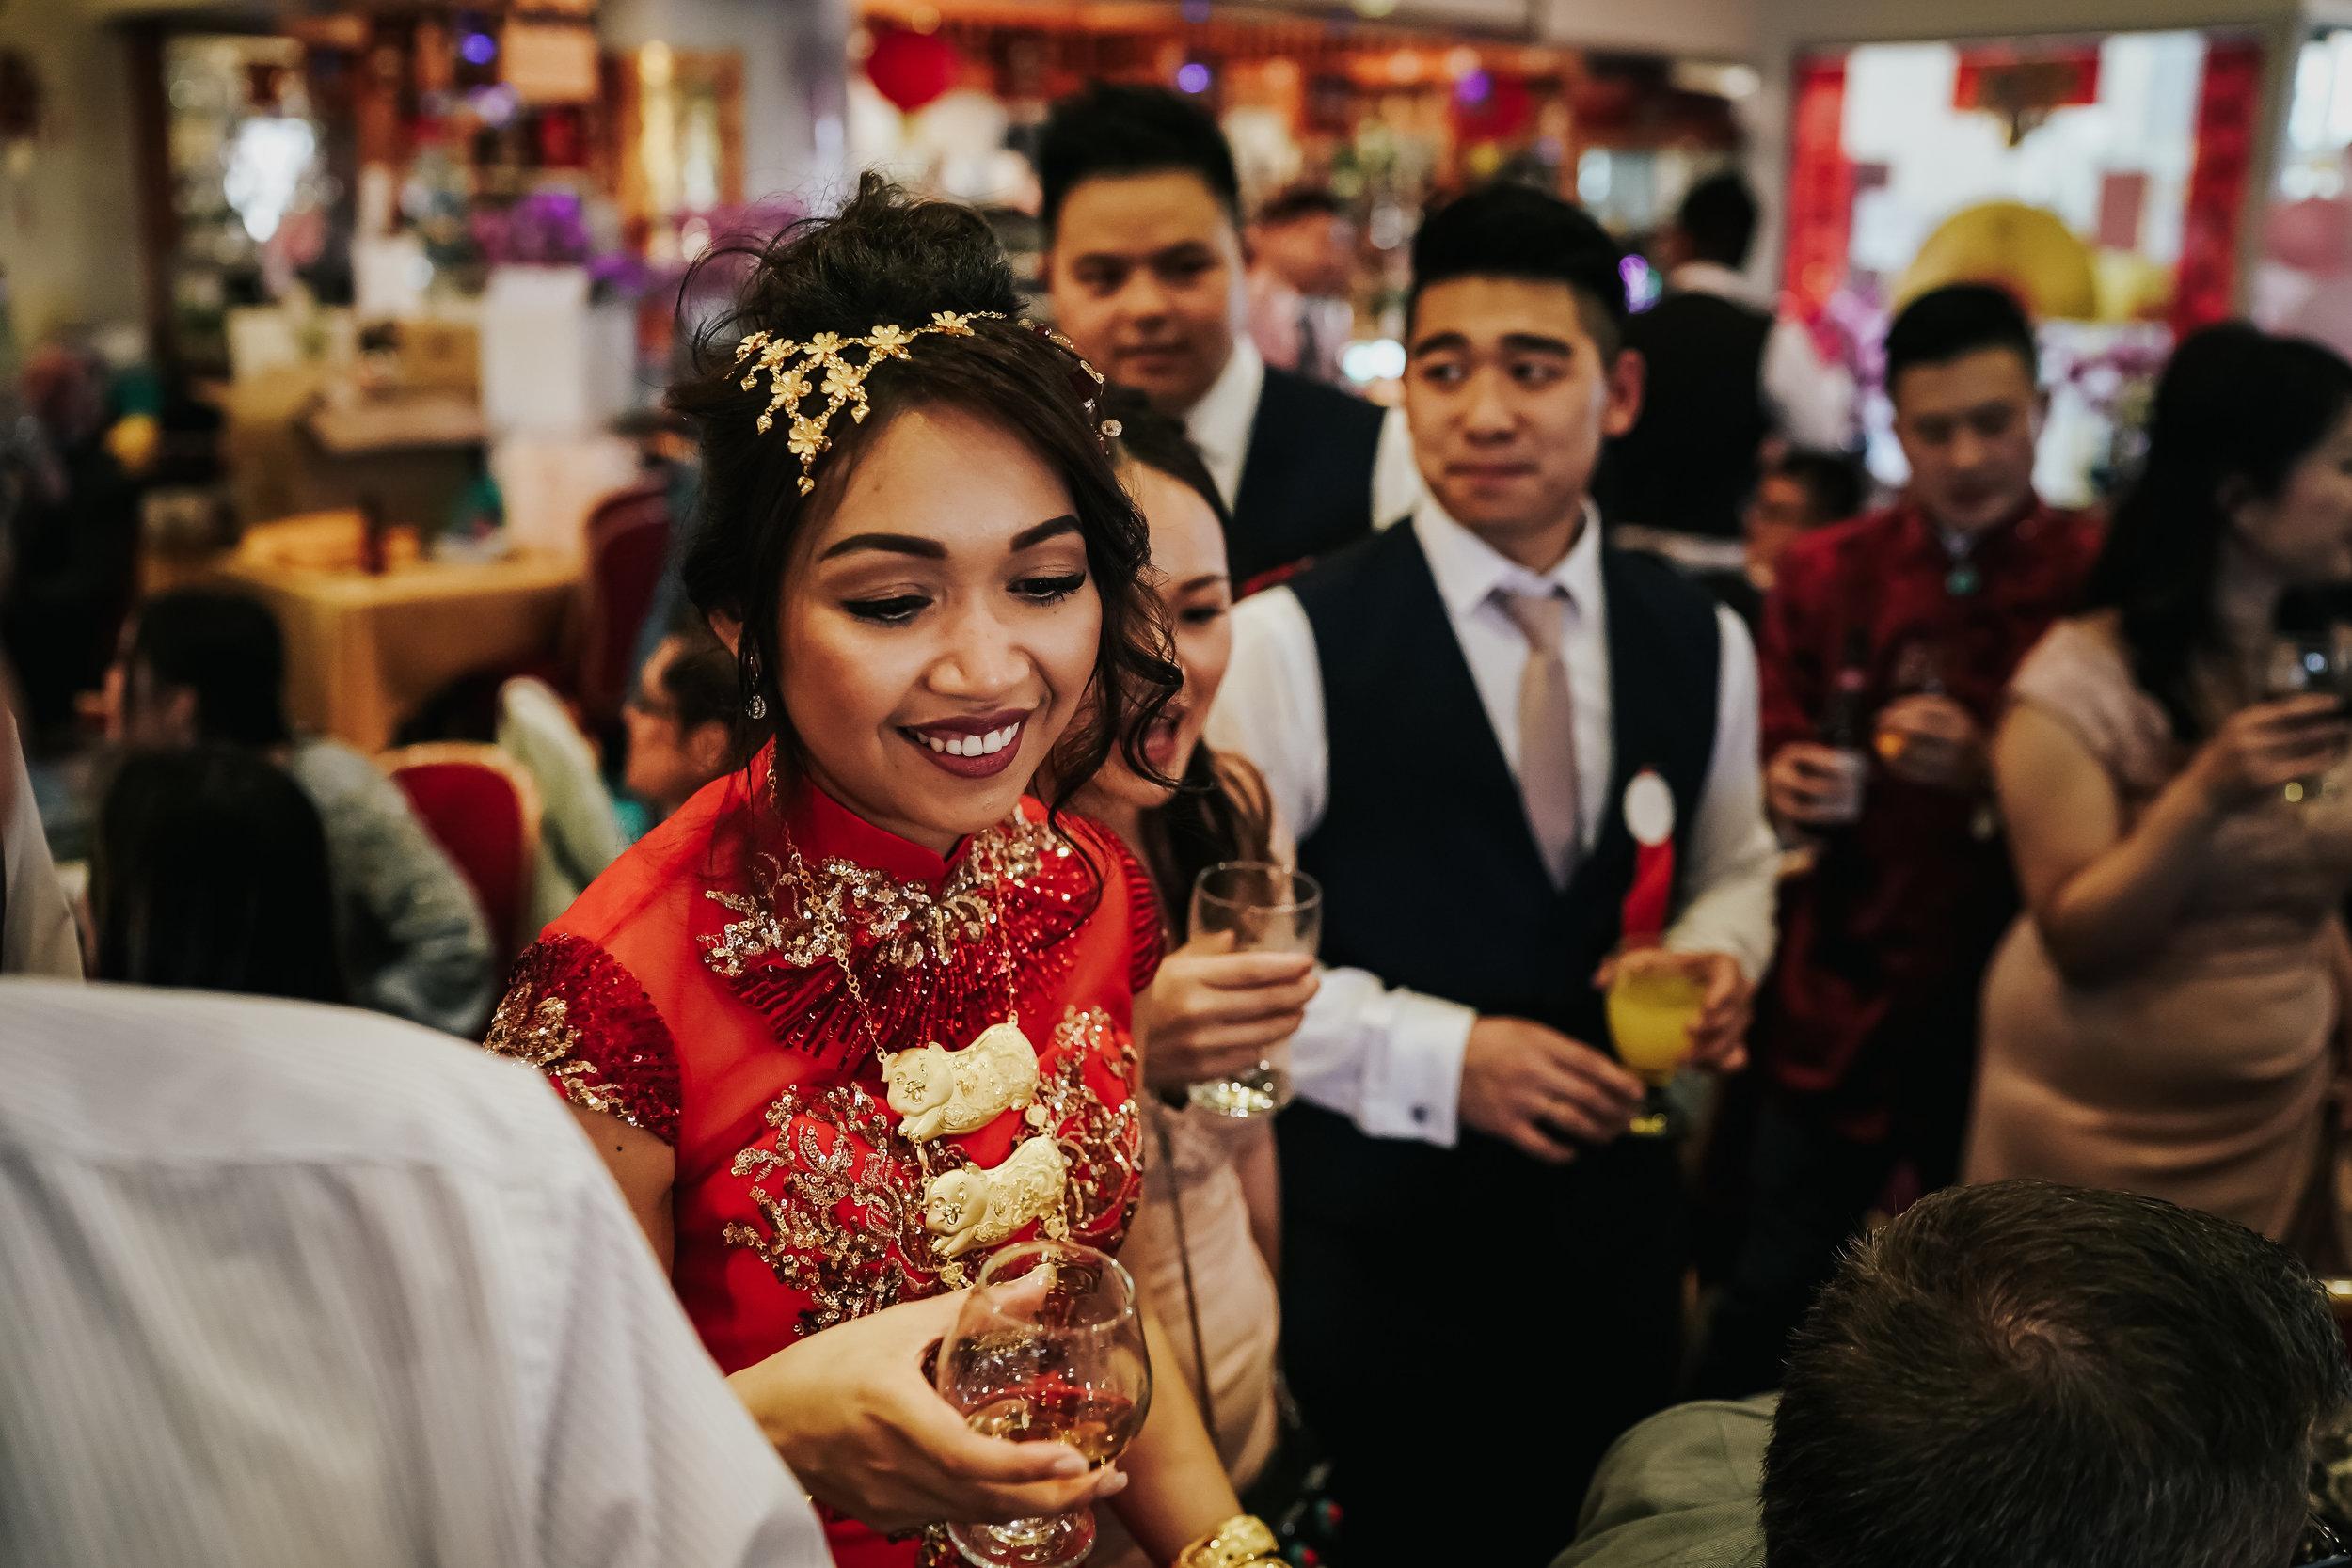 Chinese Wedding Photography Manchester wedding photographer Cheshire - 045.jpg